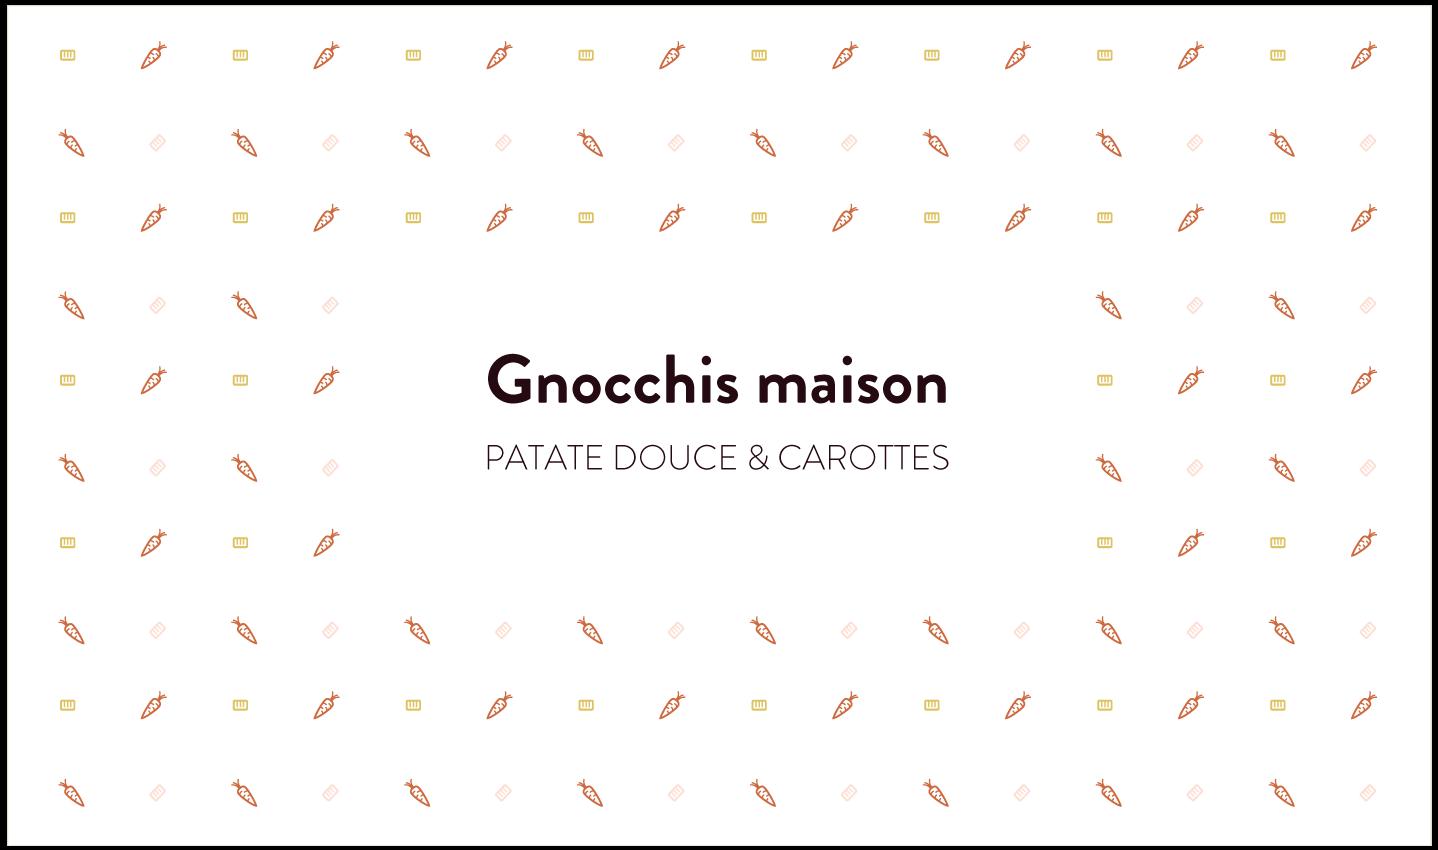 motifs-gnocchis